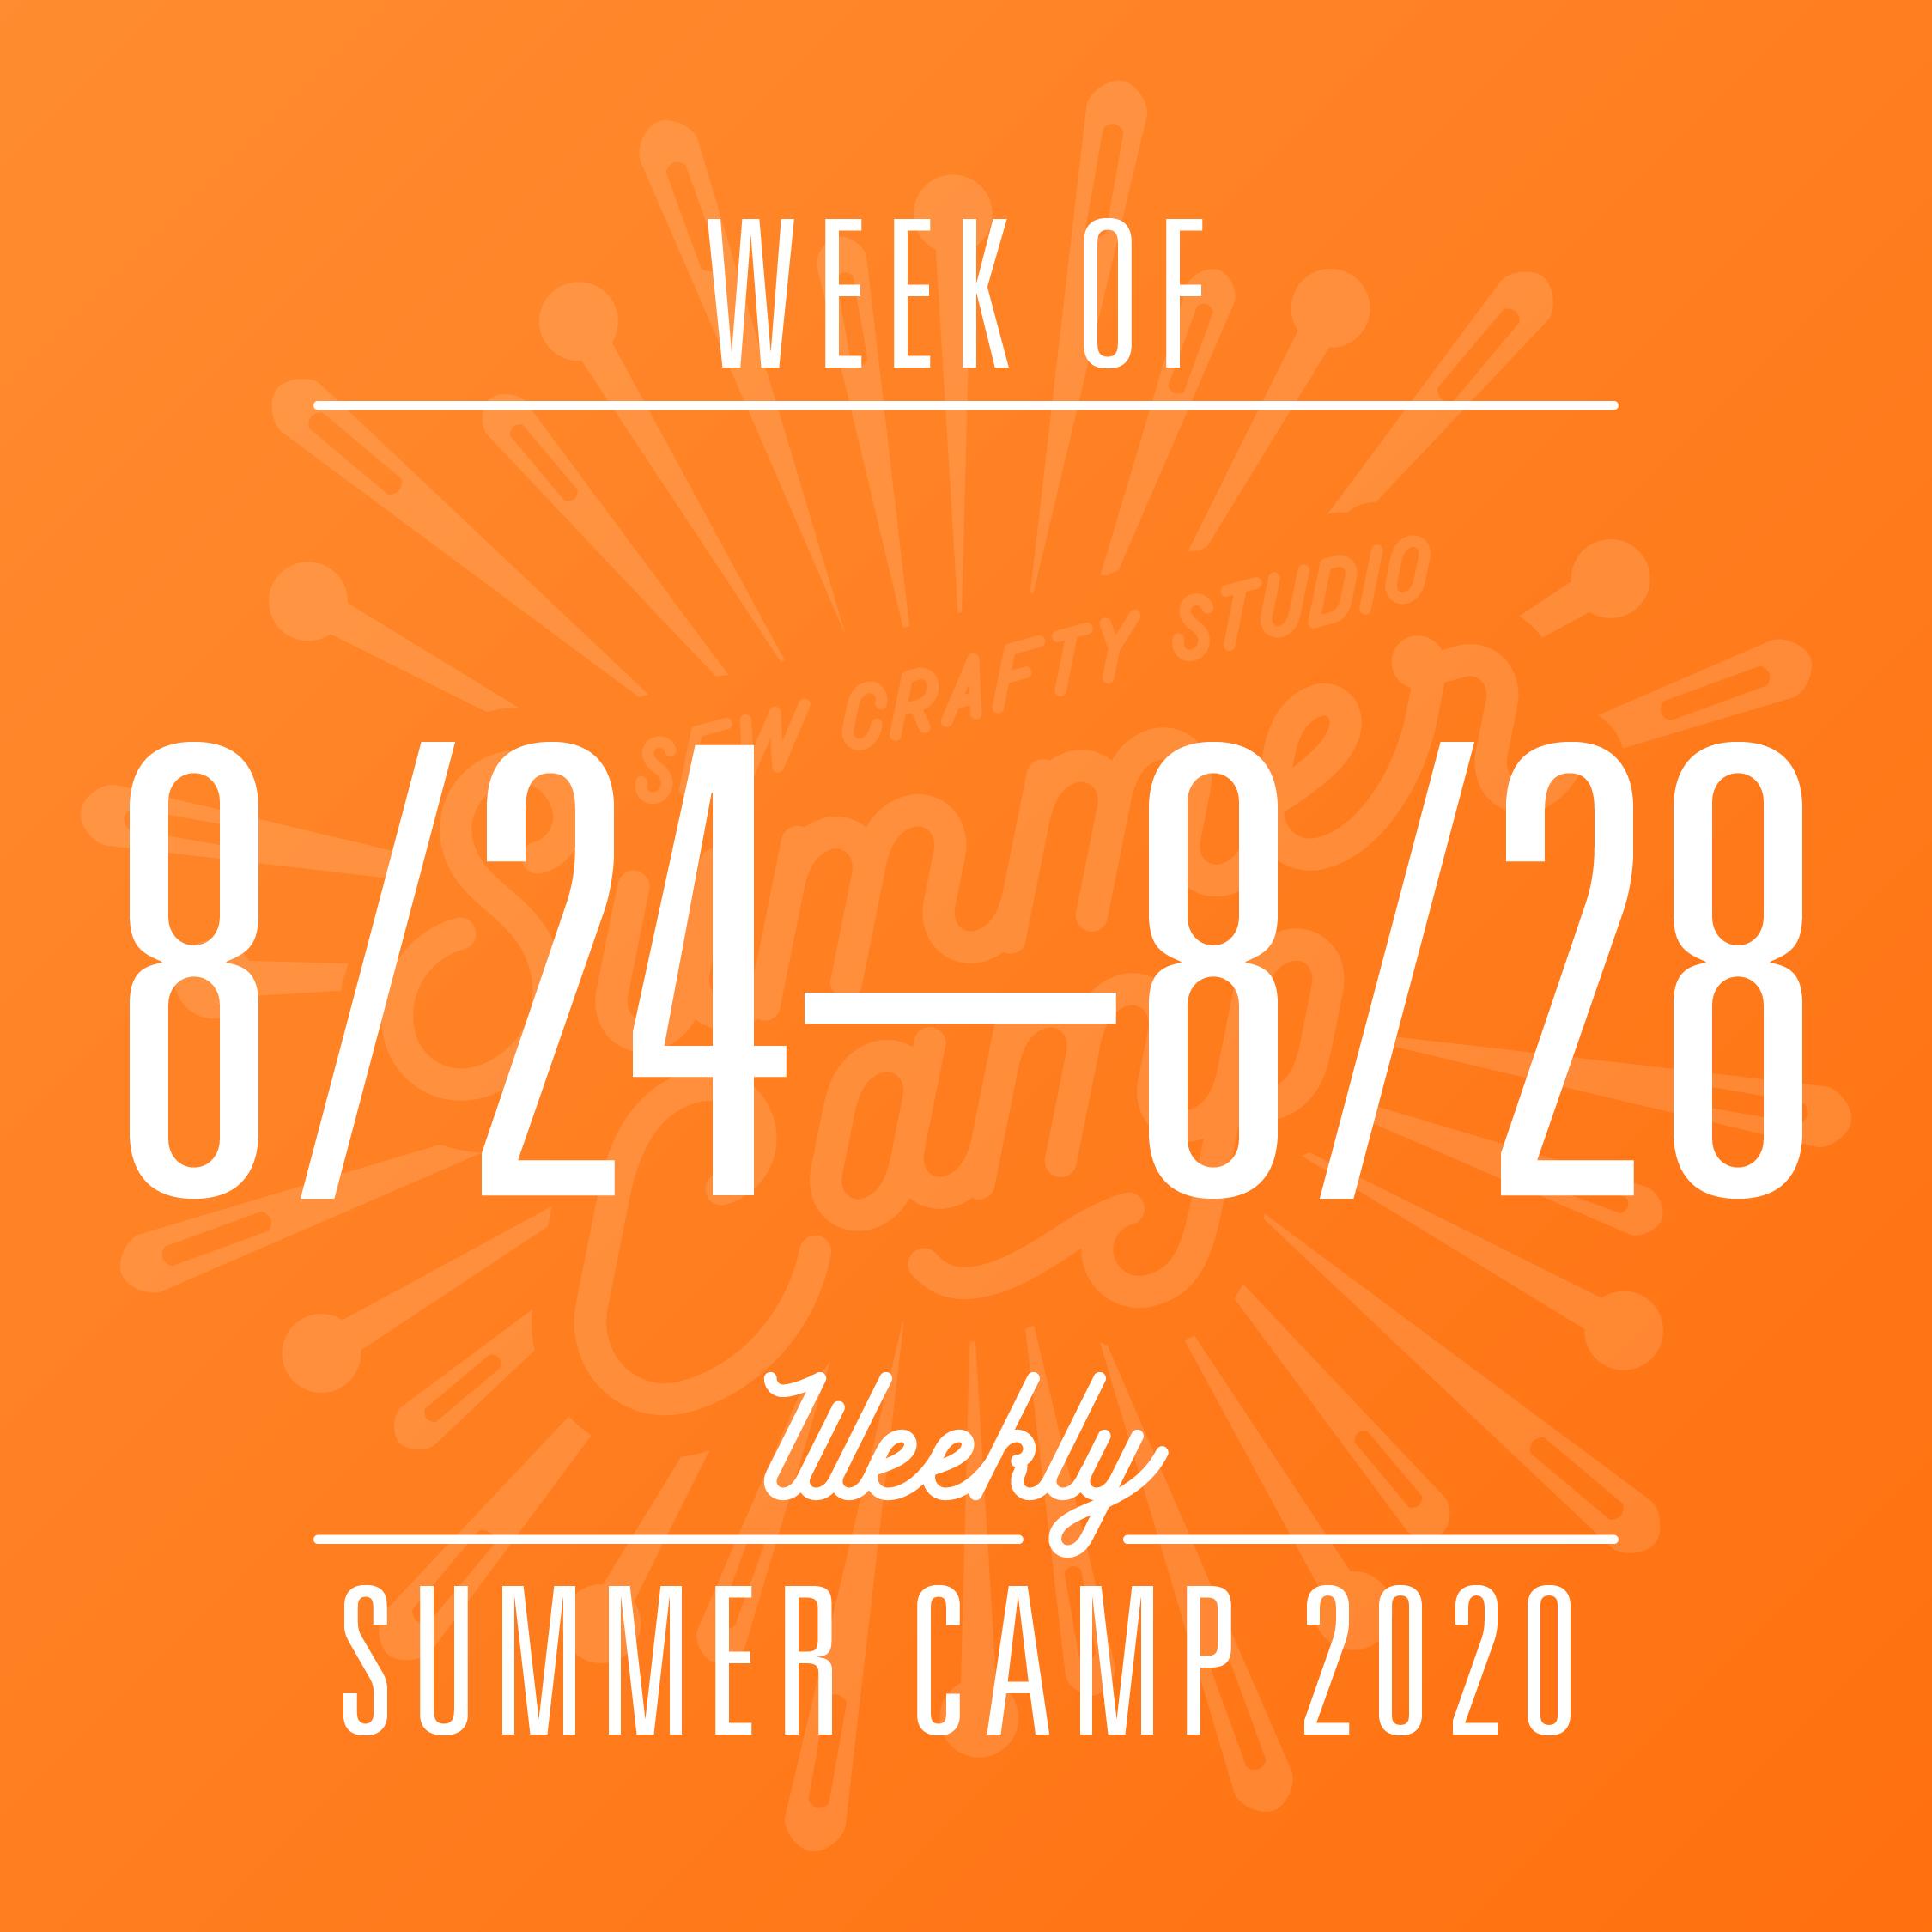 Weekly Summer Camp 8 24 8 28 Sew Crafty Studio